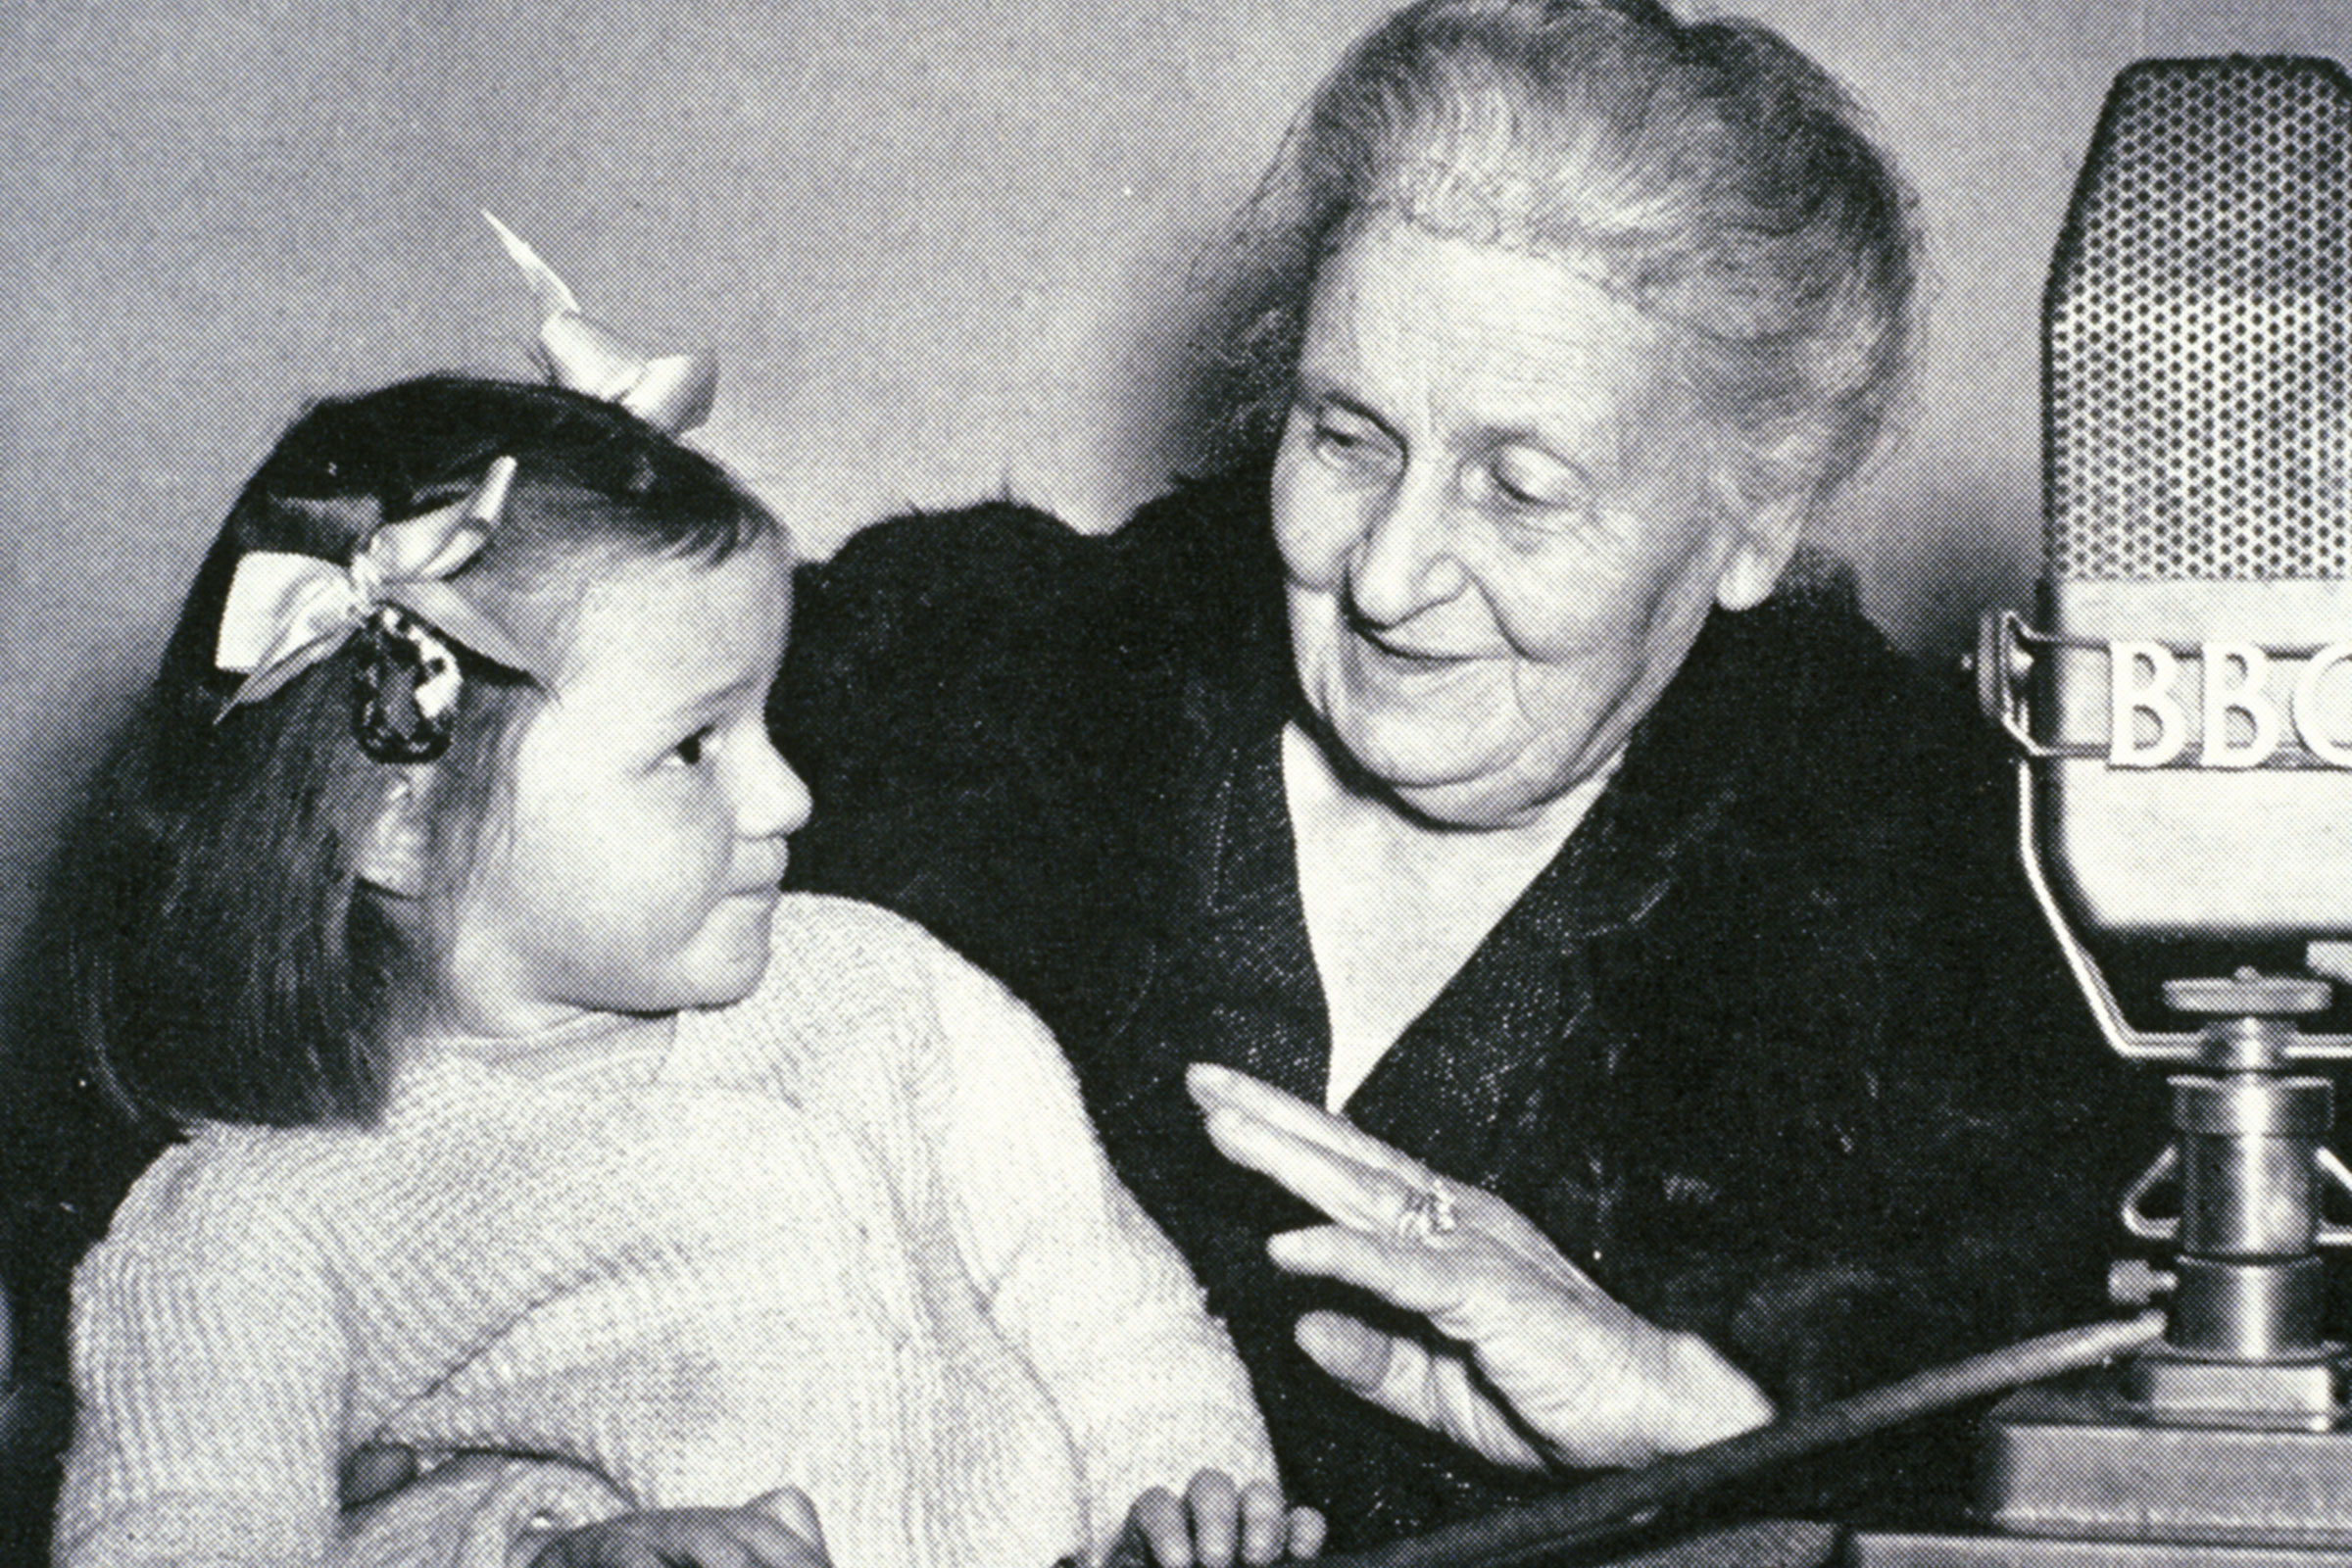 Maria Montessori with child during BBC radio broadcast